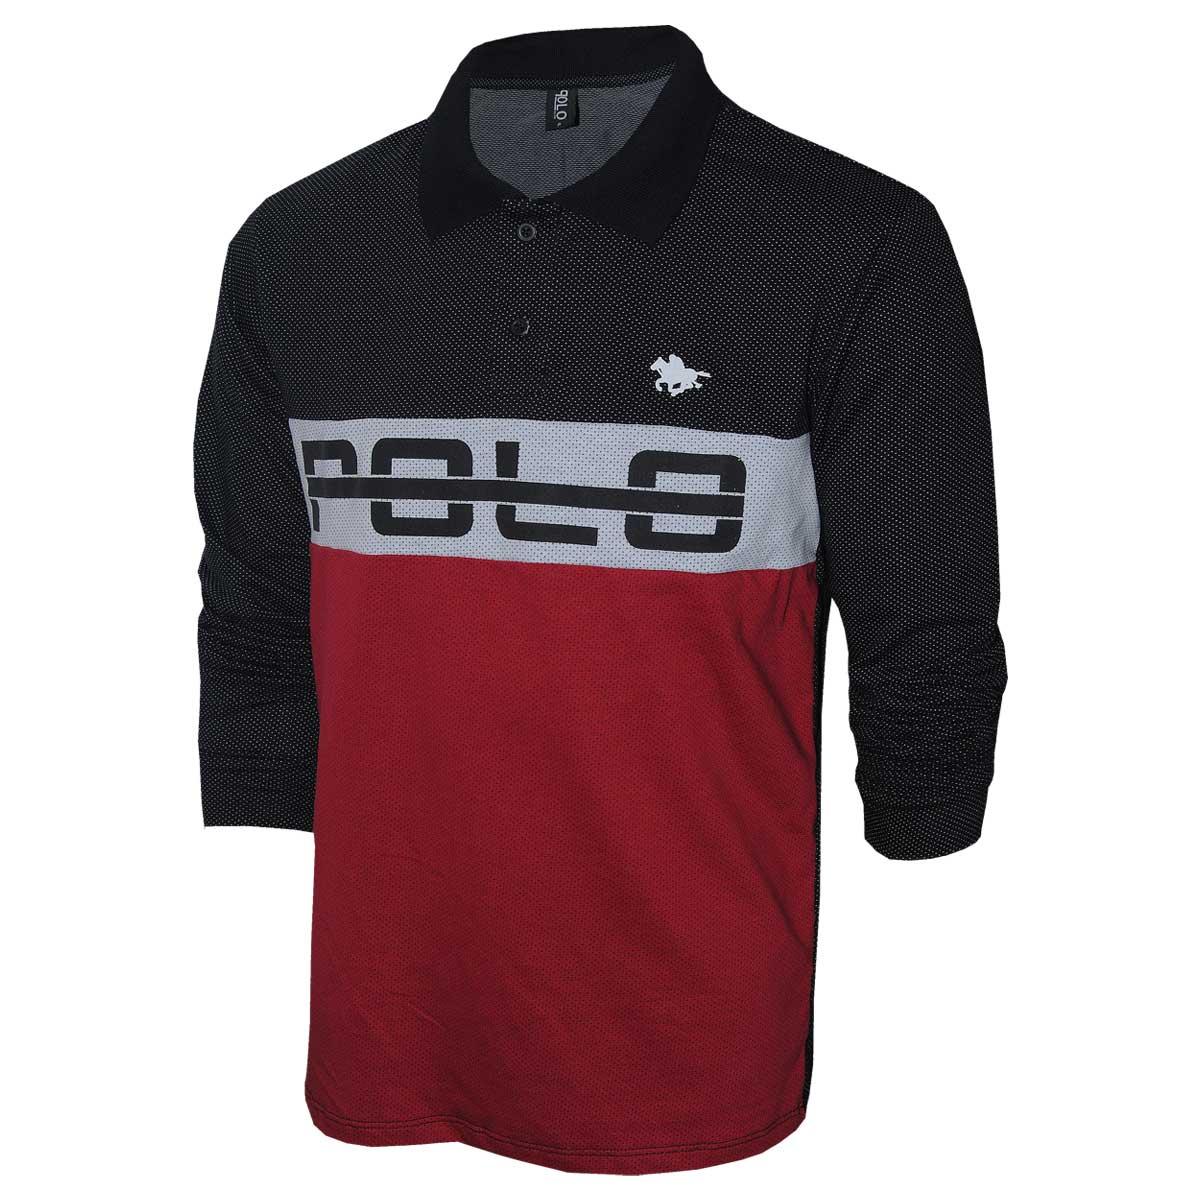 Camisa Polo Masculina Rg518 Manga Longa